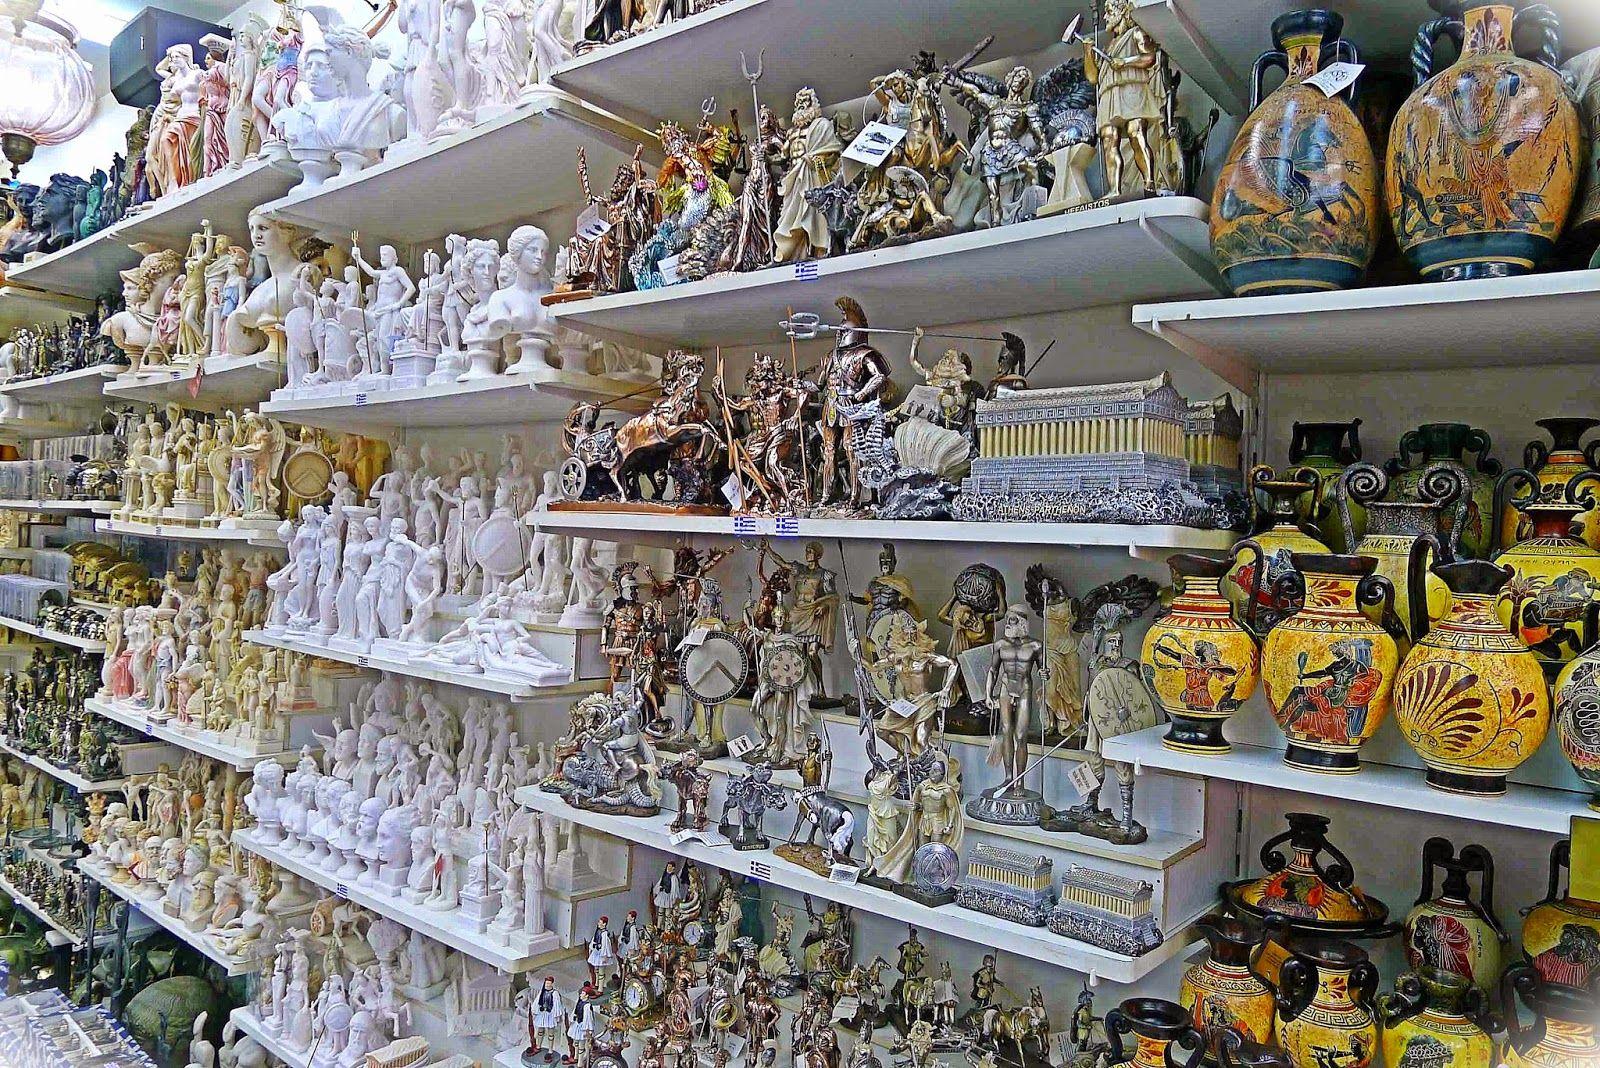 Magazin de suveniruri in Limenas